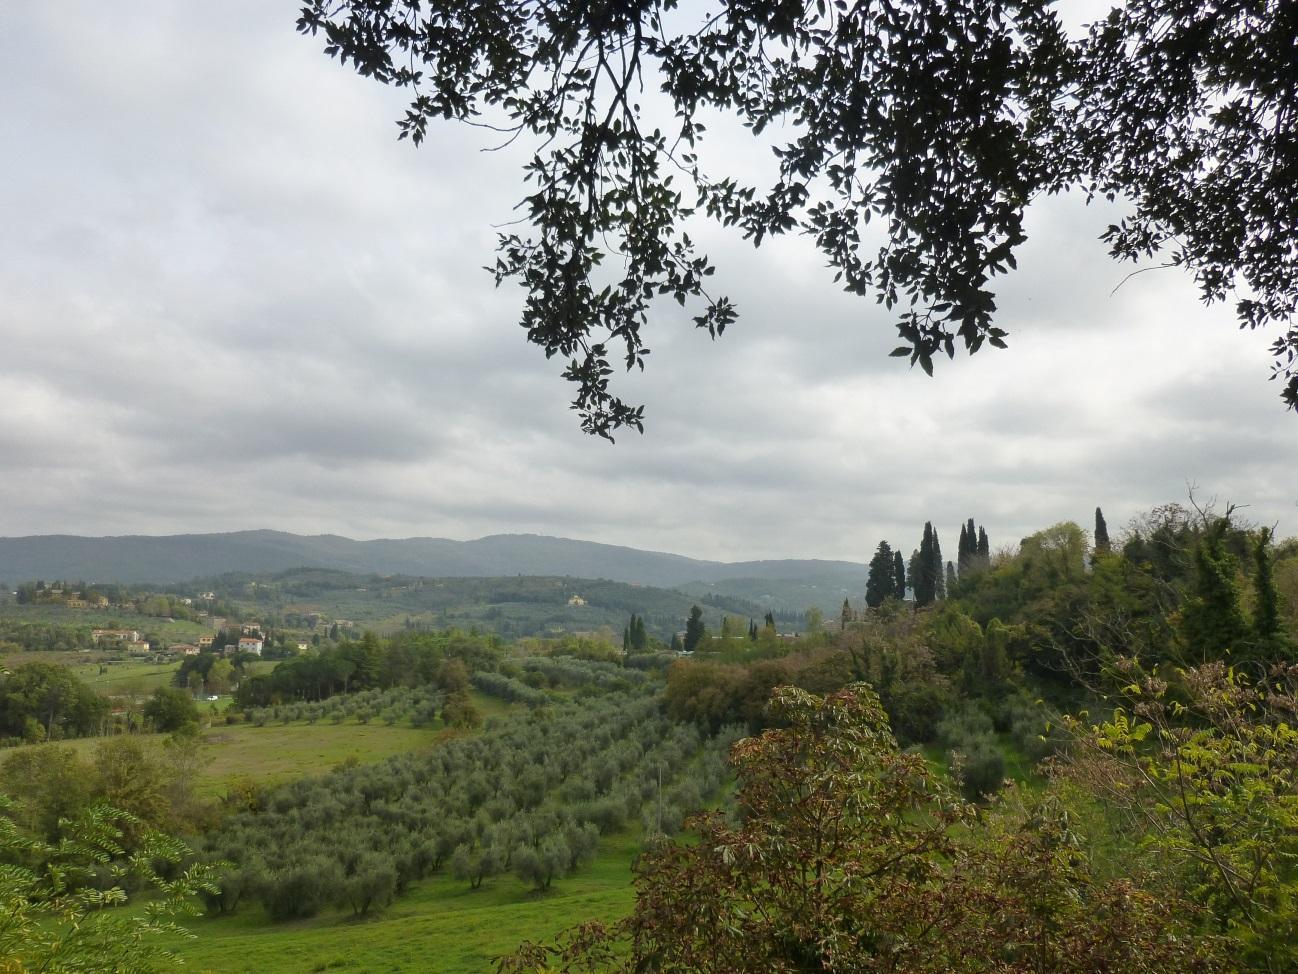 C:\Users\Gonzalo\Desktop\Documentos\Fotografías\La Toscana\103_PANA\103_PANA\P1030233.JPG